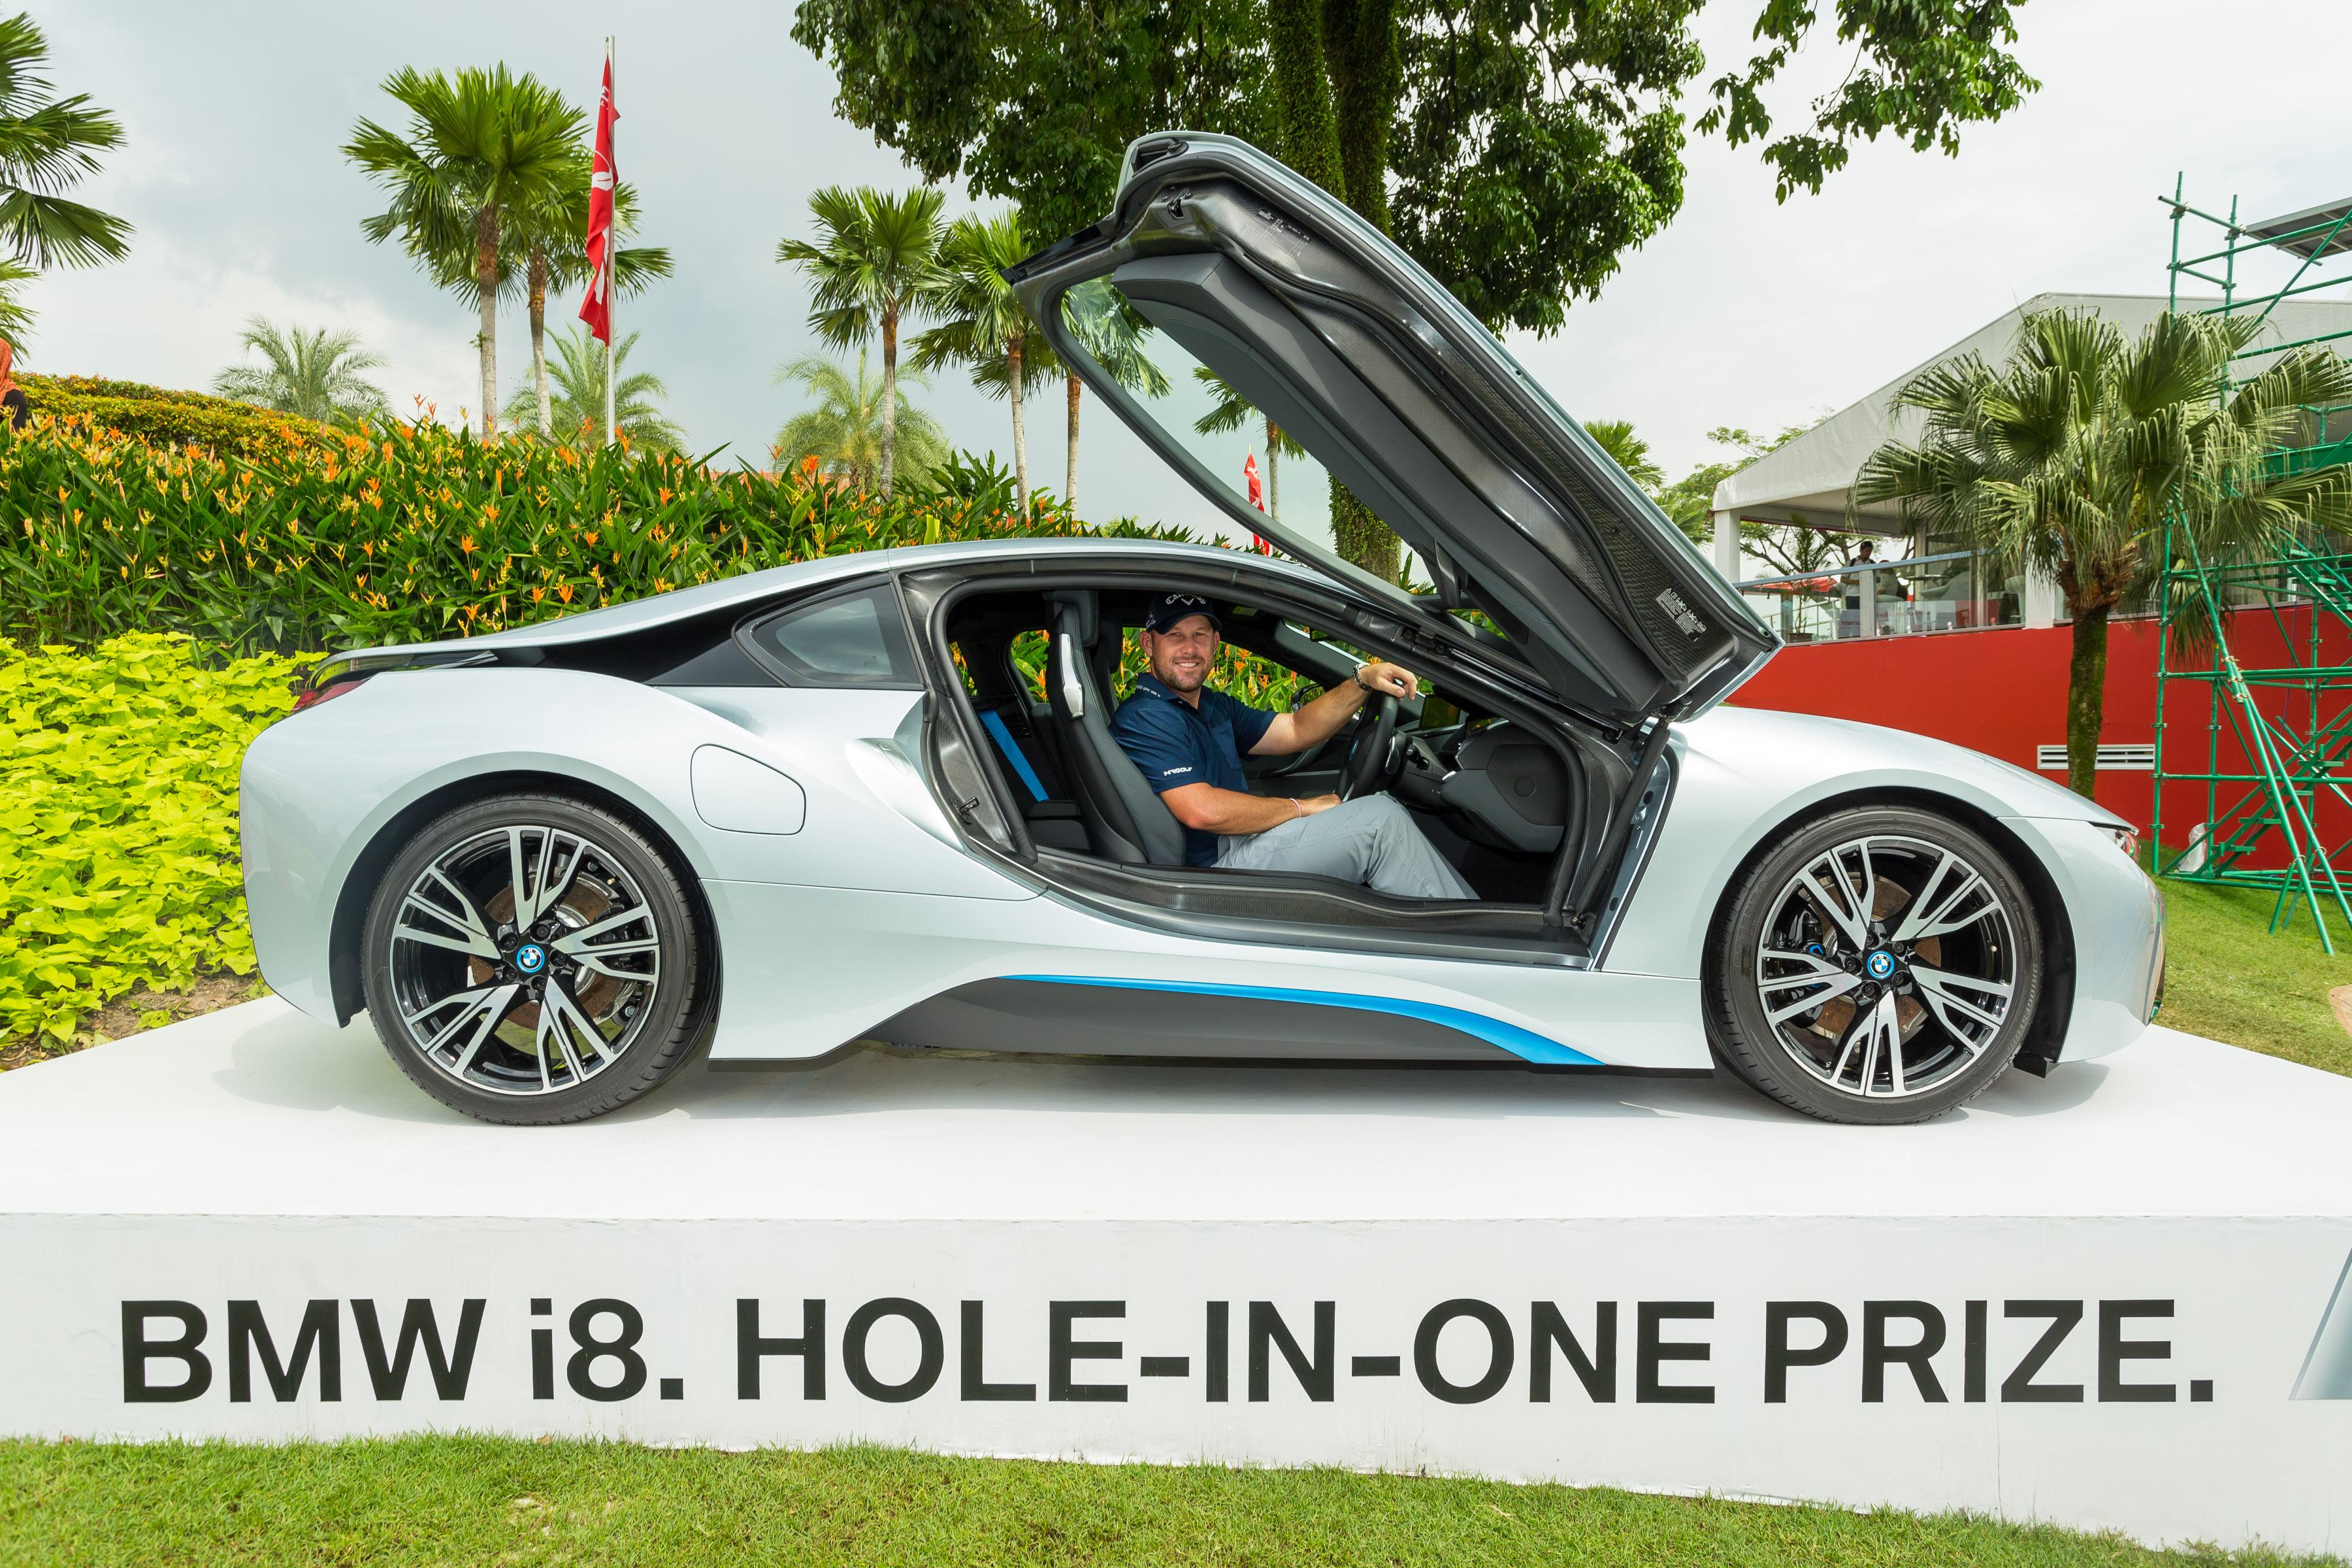 Scott Brown in the All New BMW i8 golfguru